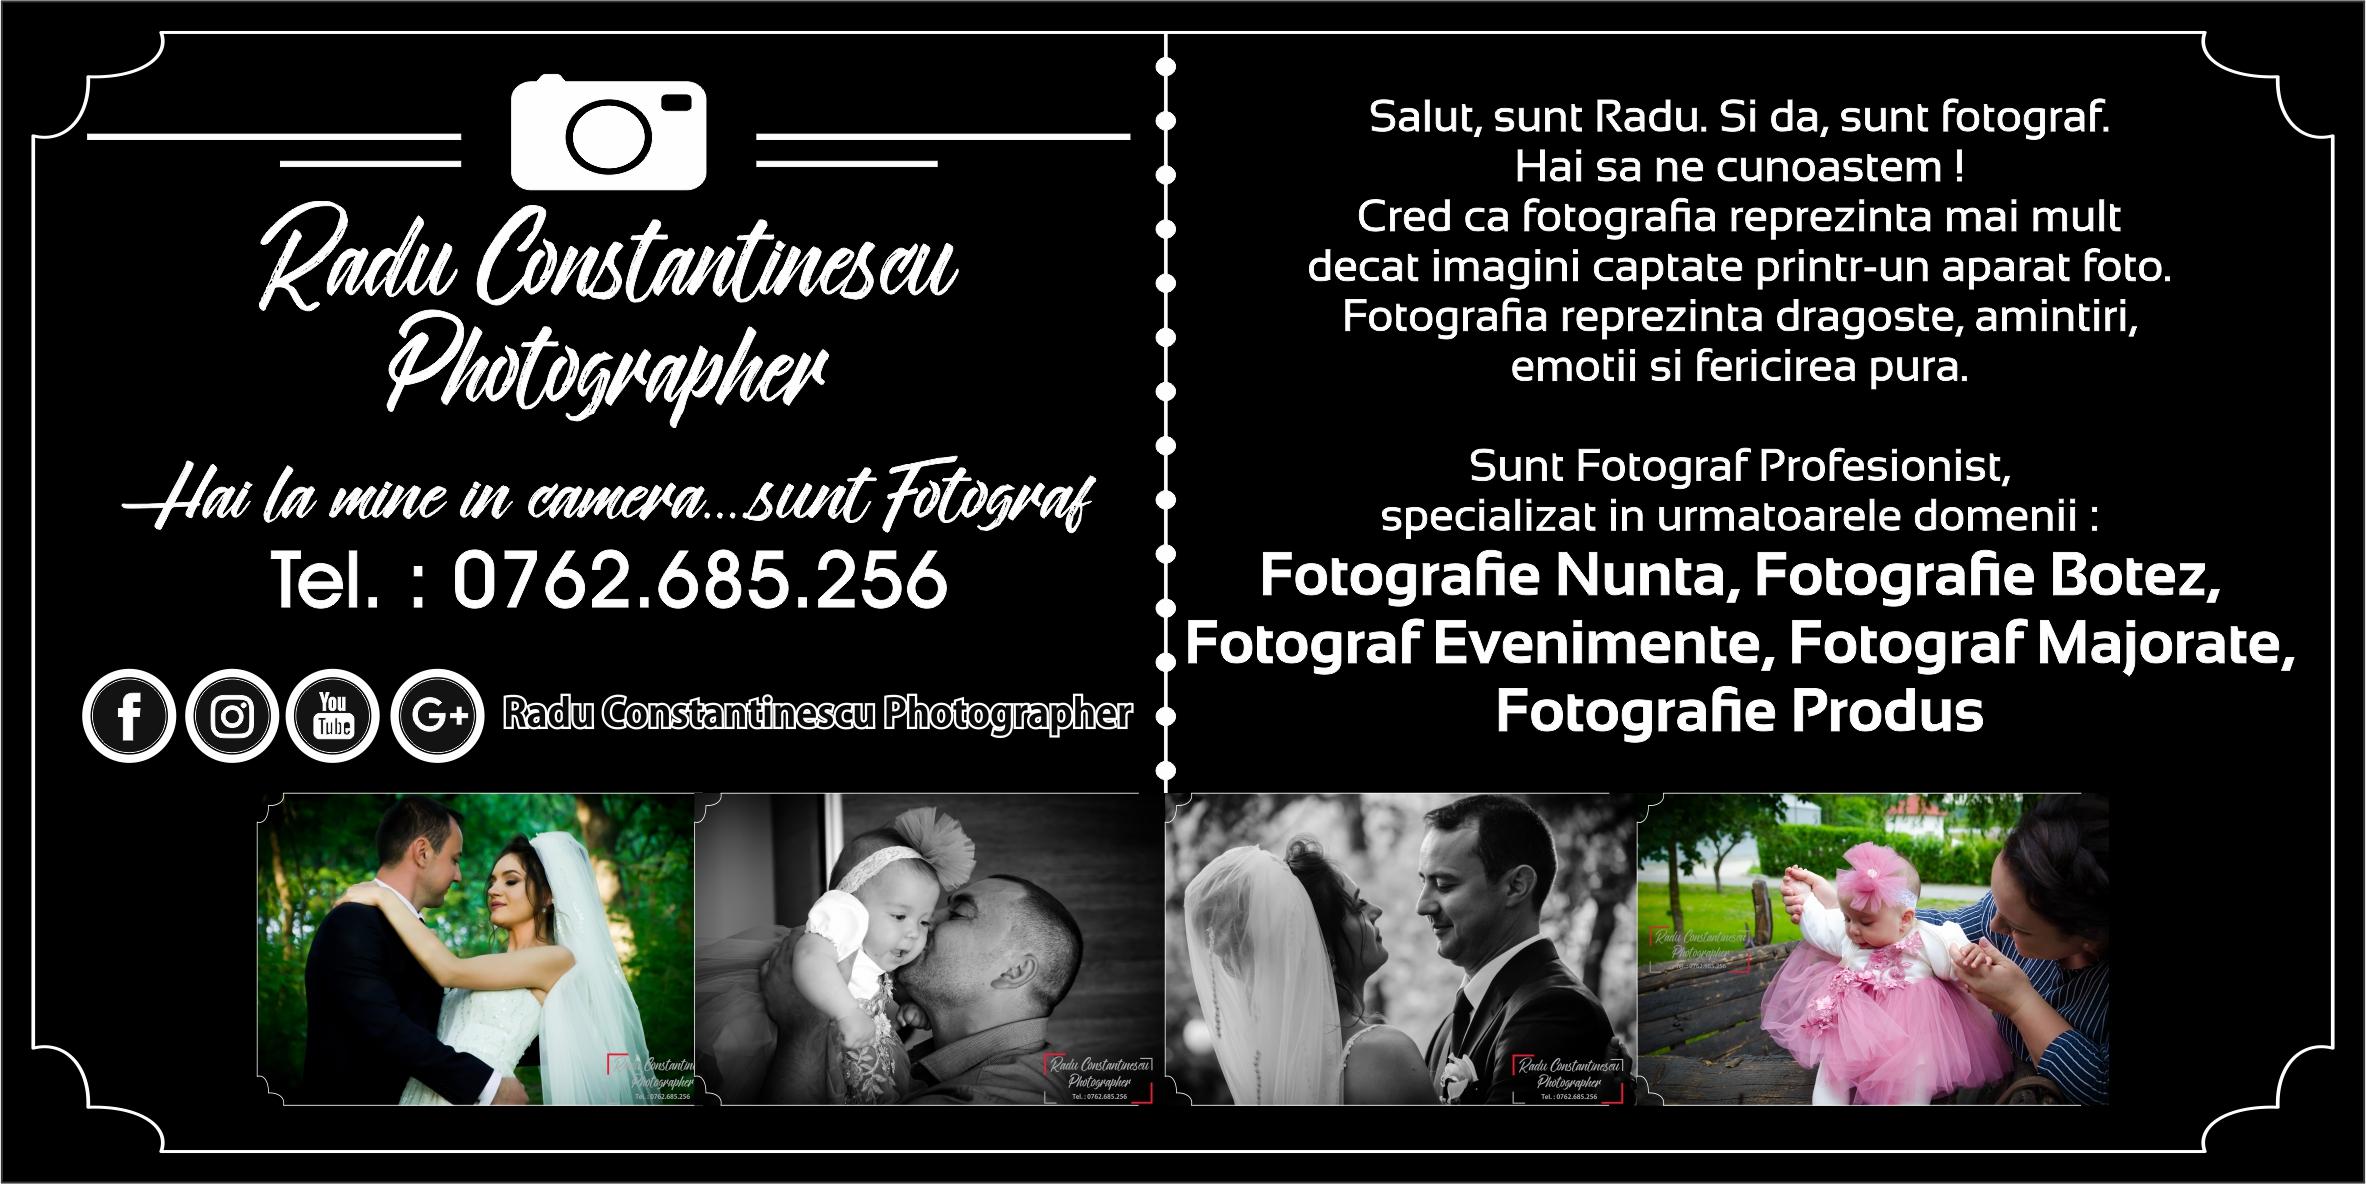 Oferta Fotograf Botez Craiova, Slatina, Caracal, Calafat, Severin, Taragu Jiu, Bals